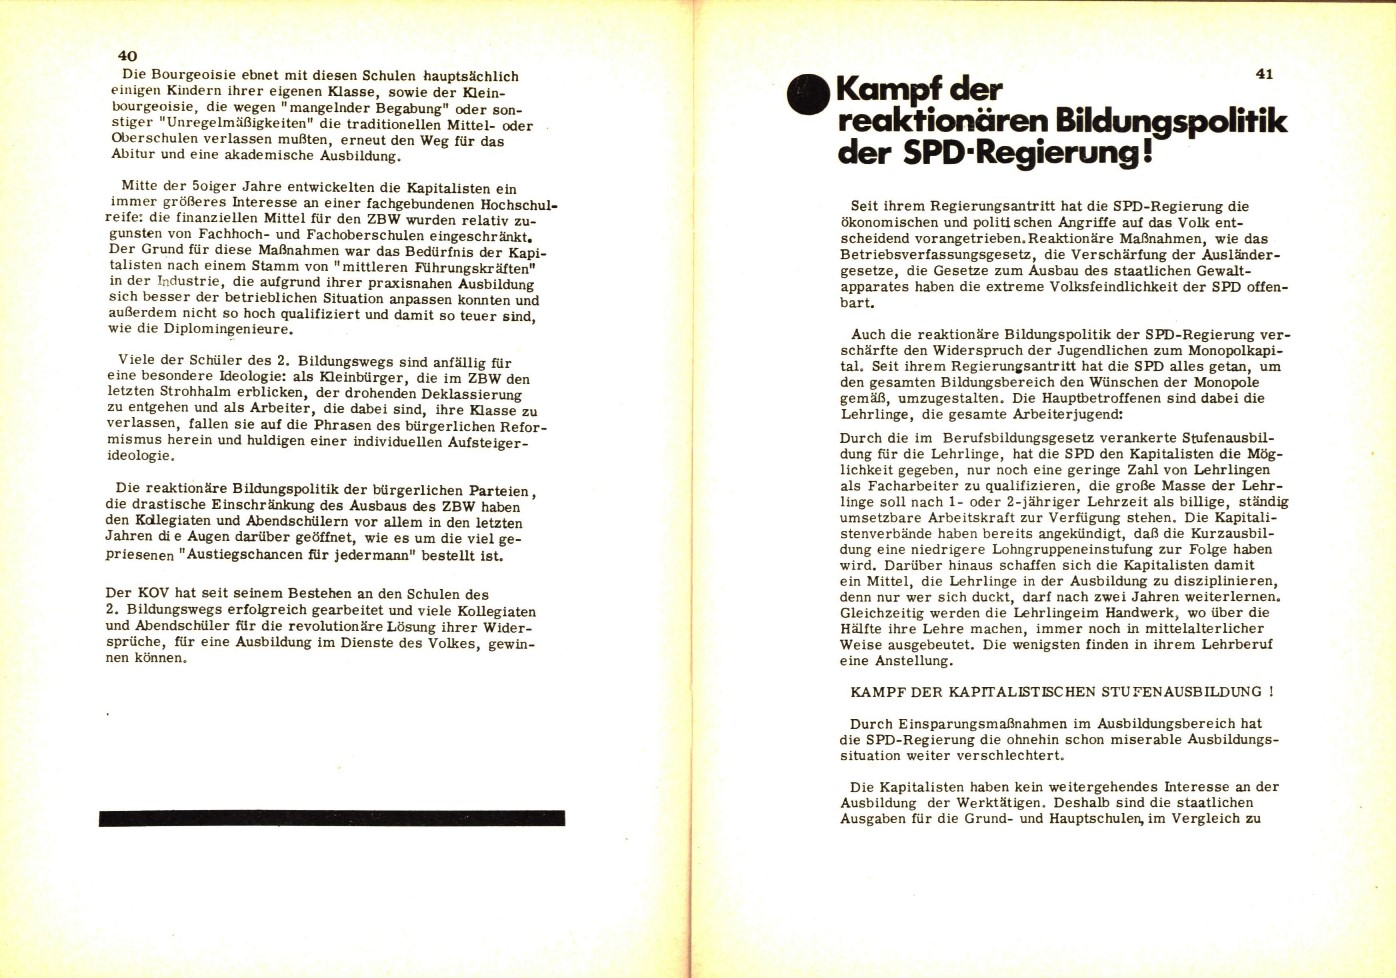 KOV_1973_Aktionsprogramm_23